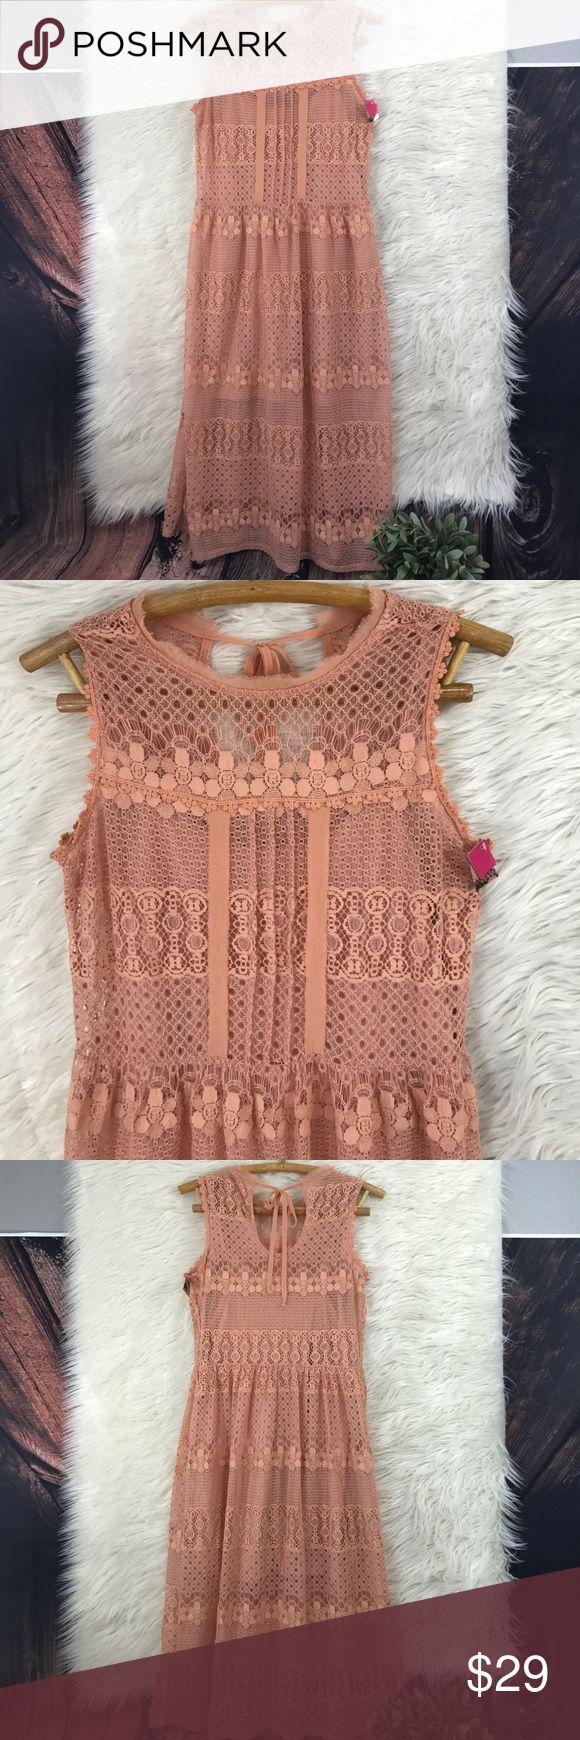 "NWT Target xhilaration peach lace boho dress NWT Gorgeous peach lace dress from Target xhilaration . Tie back. Size M 56% cotton 44% nylon. 45"" long Xhilaration Dresses"